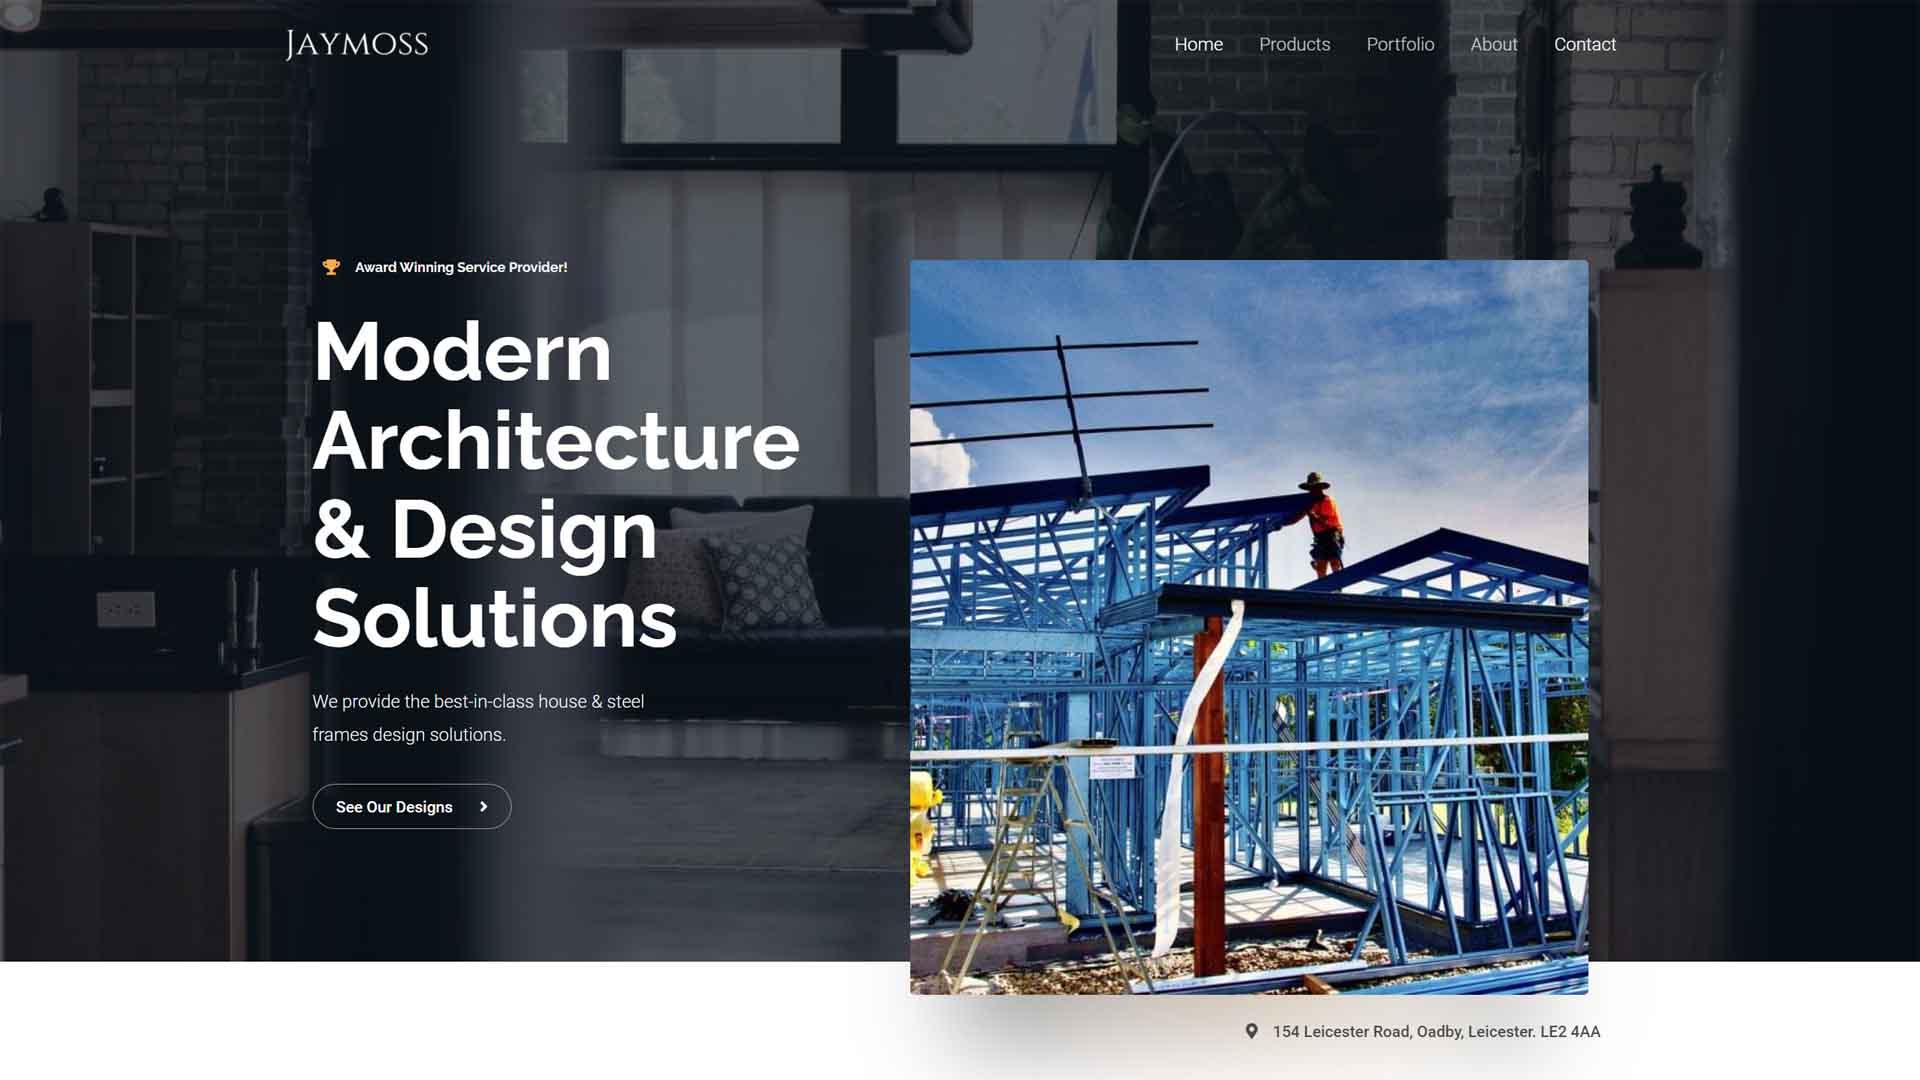 Jaymoss Website Design & Development